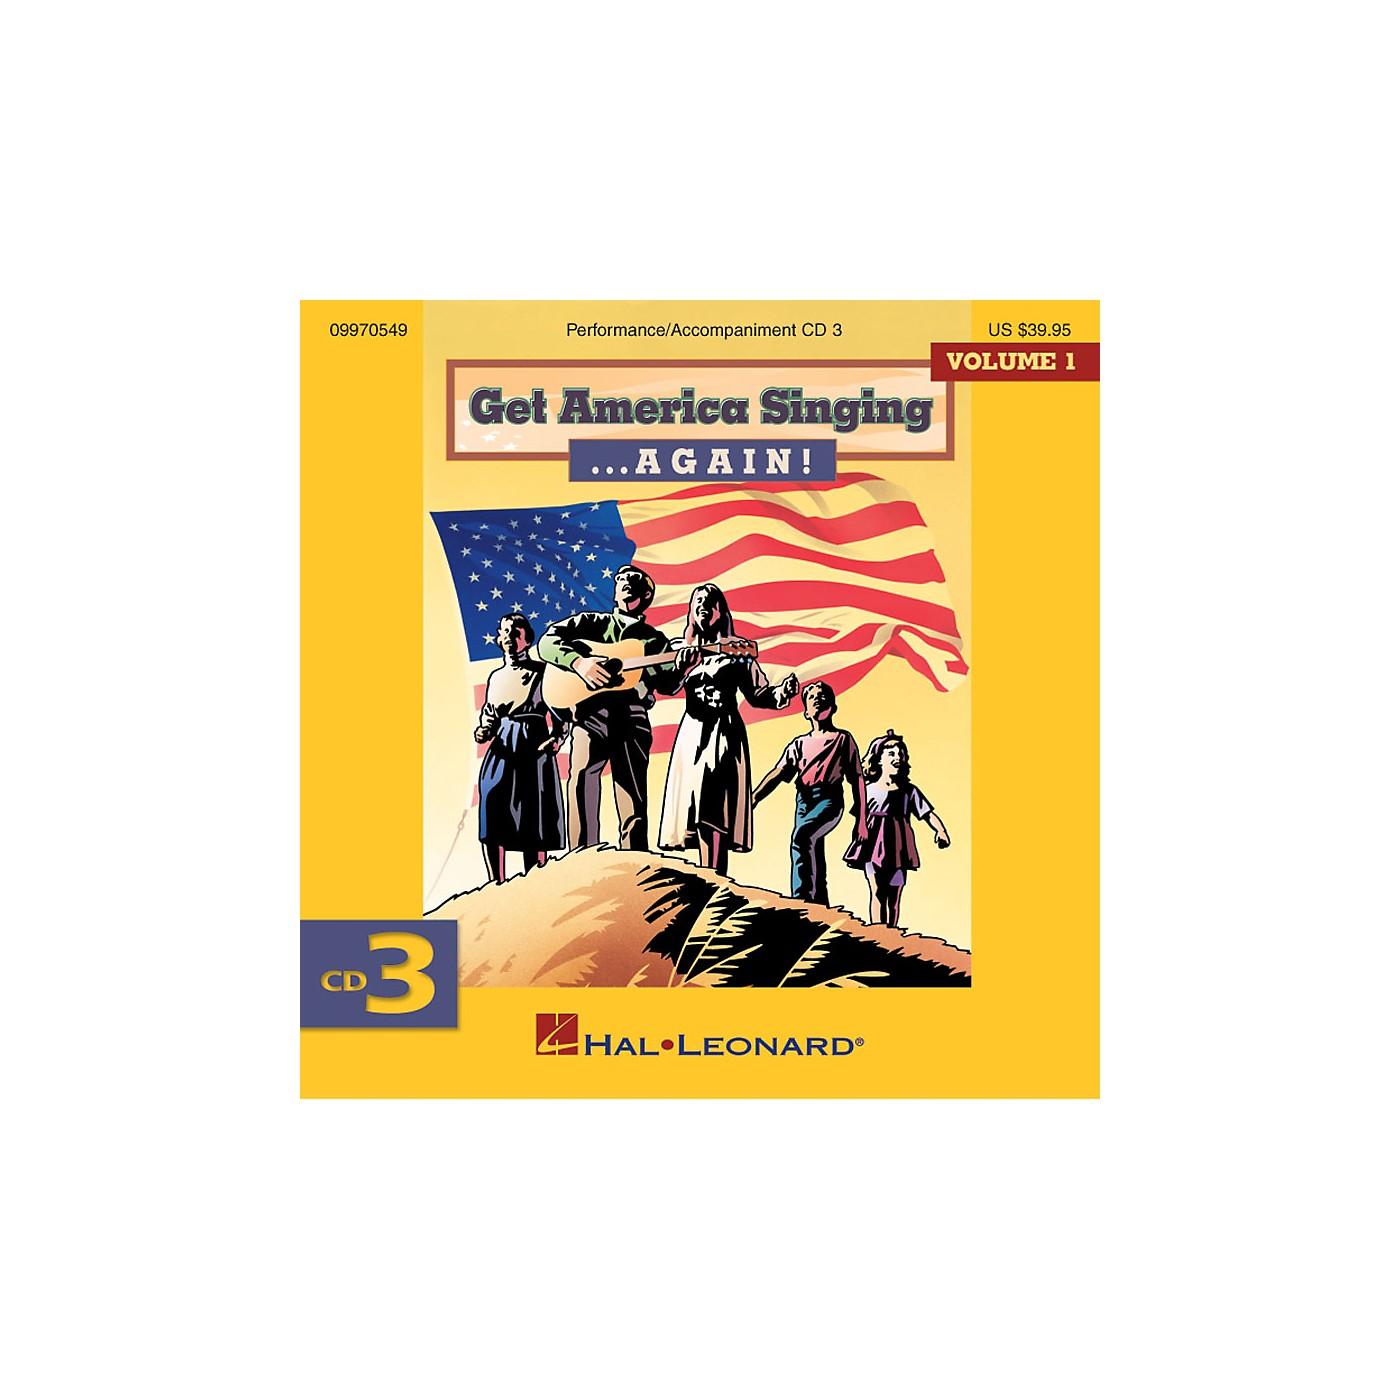 Hal Leonard Get America Singing ... Again! Vol 1 CD Three Volume One CD Three thumbnail